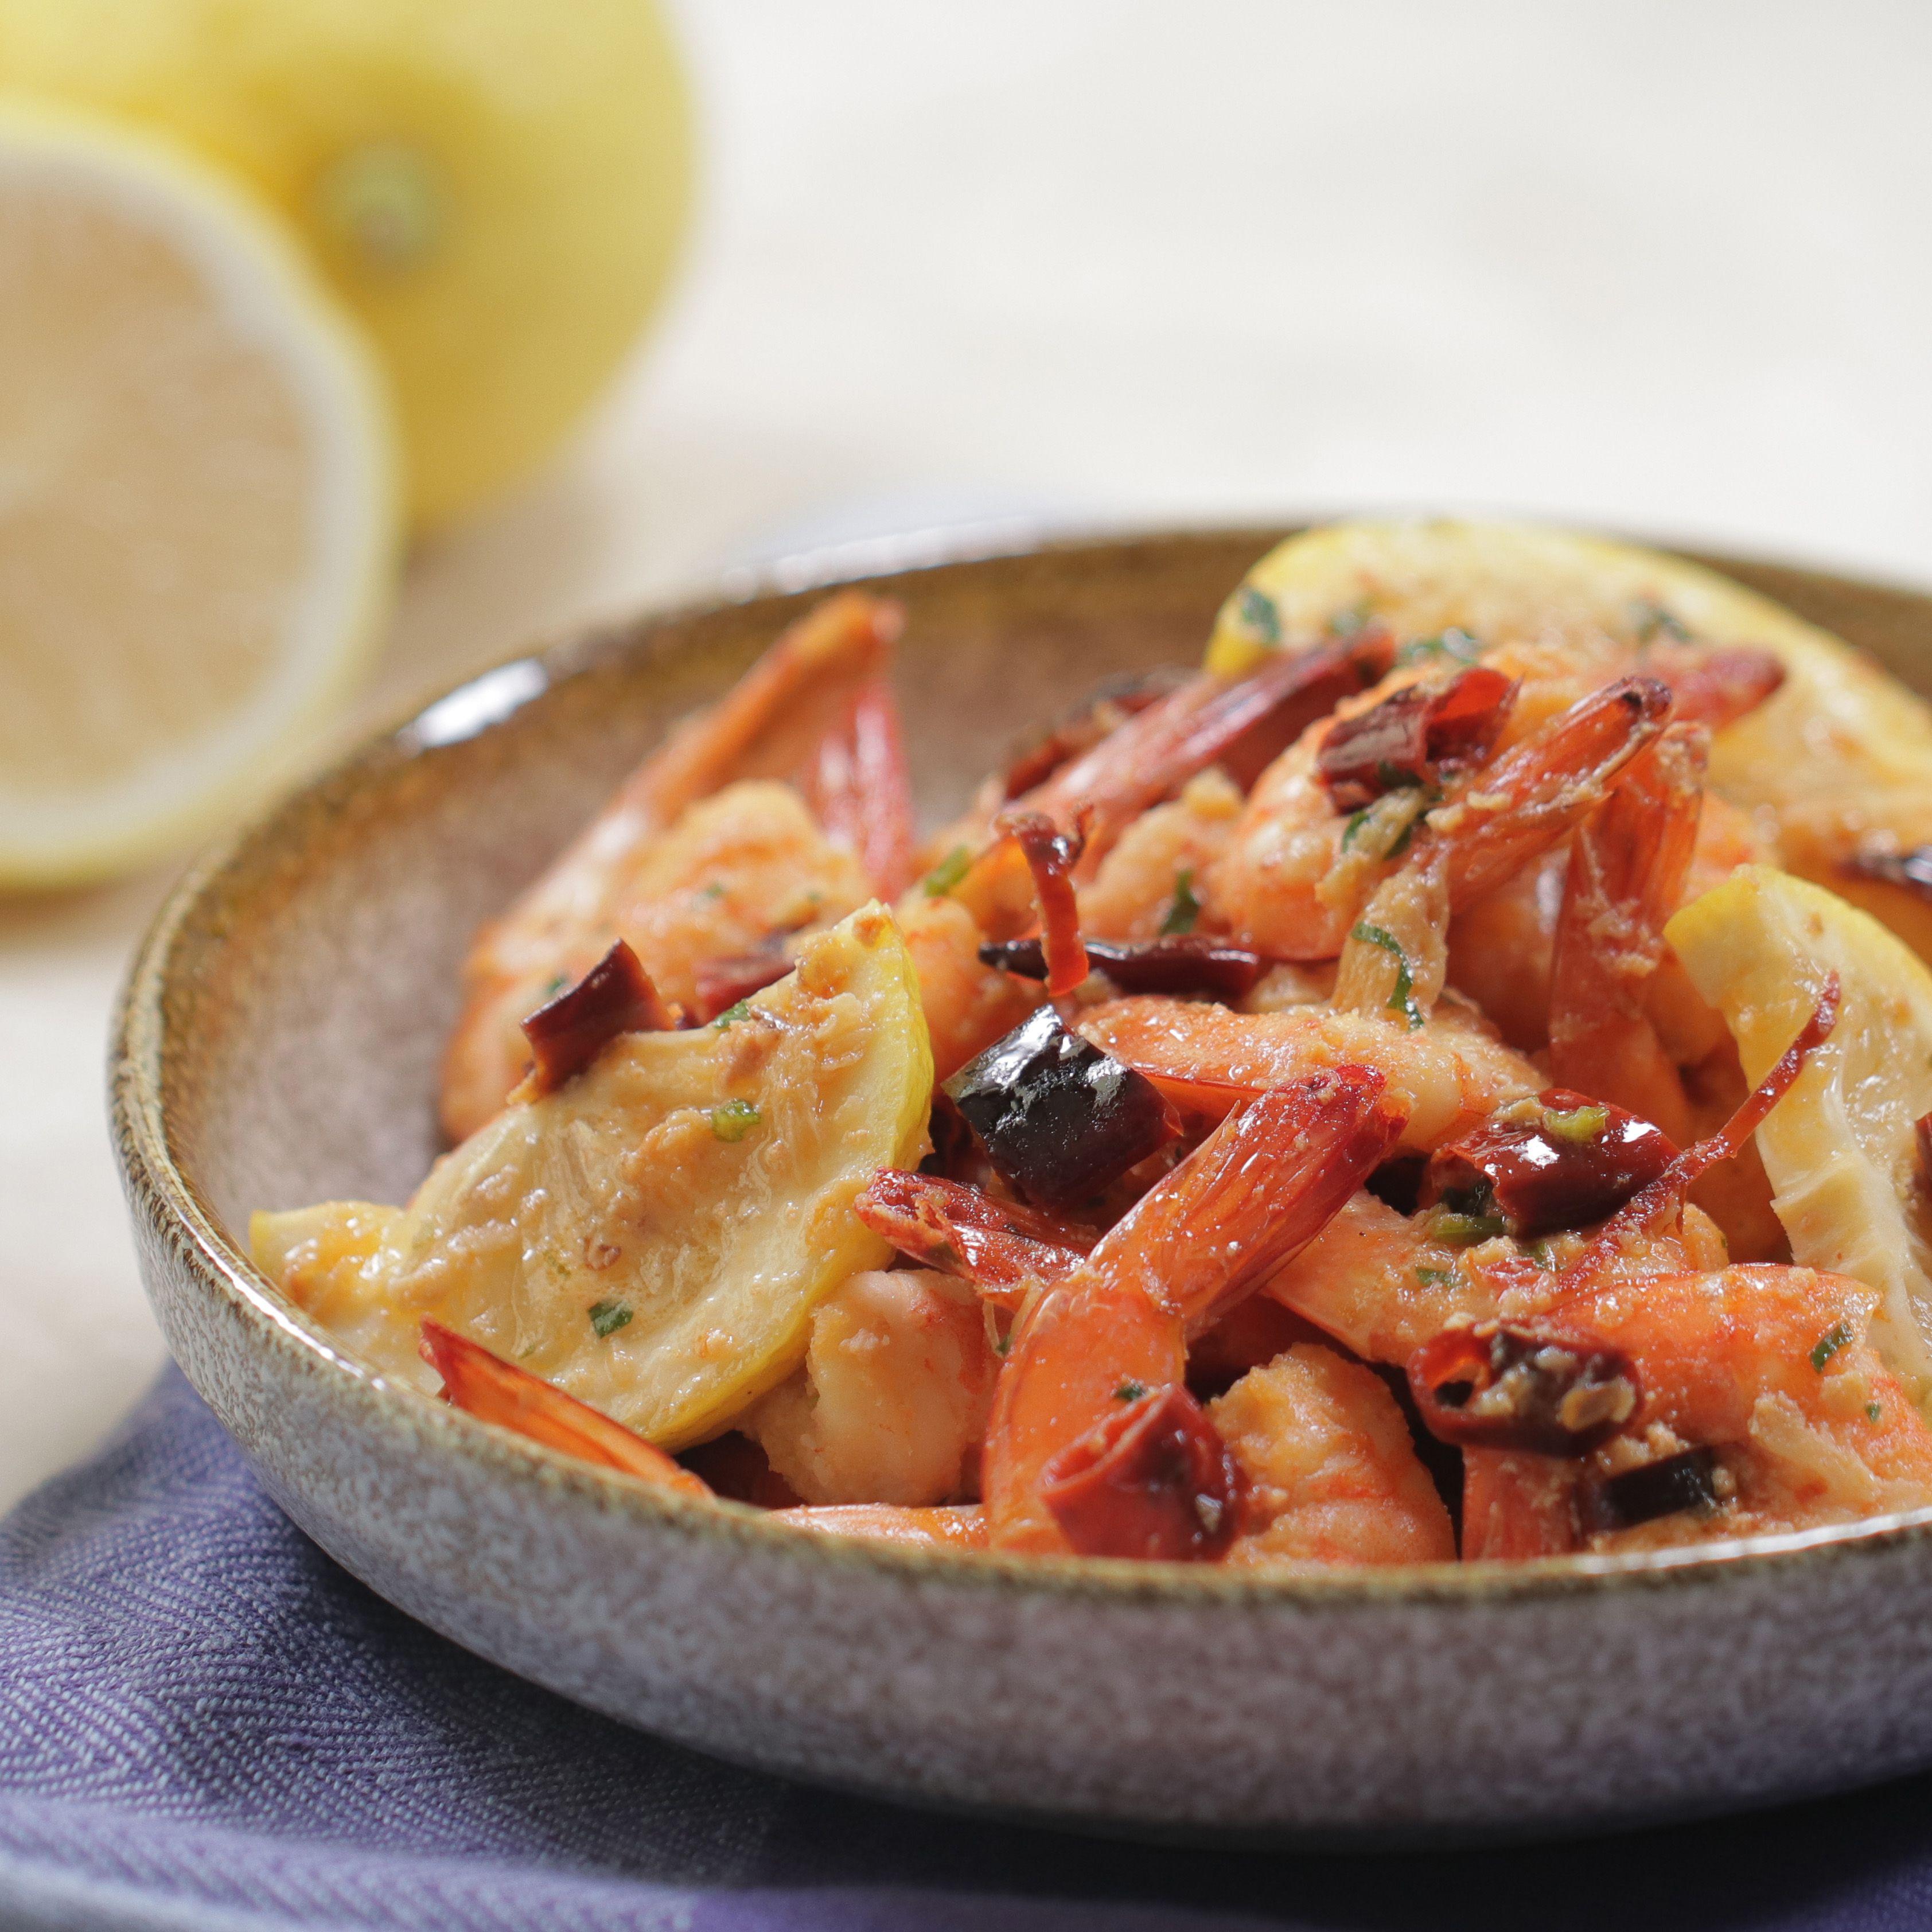 Resep Spicy Garlic Shrimp Makan Malam Resep Seafood Makanan